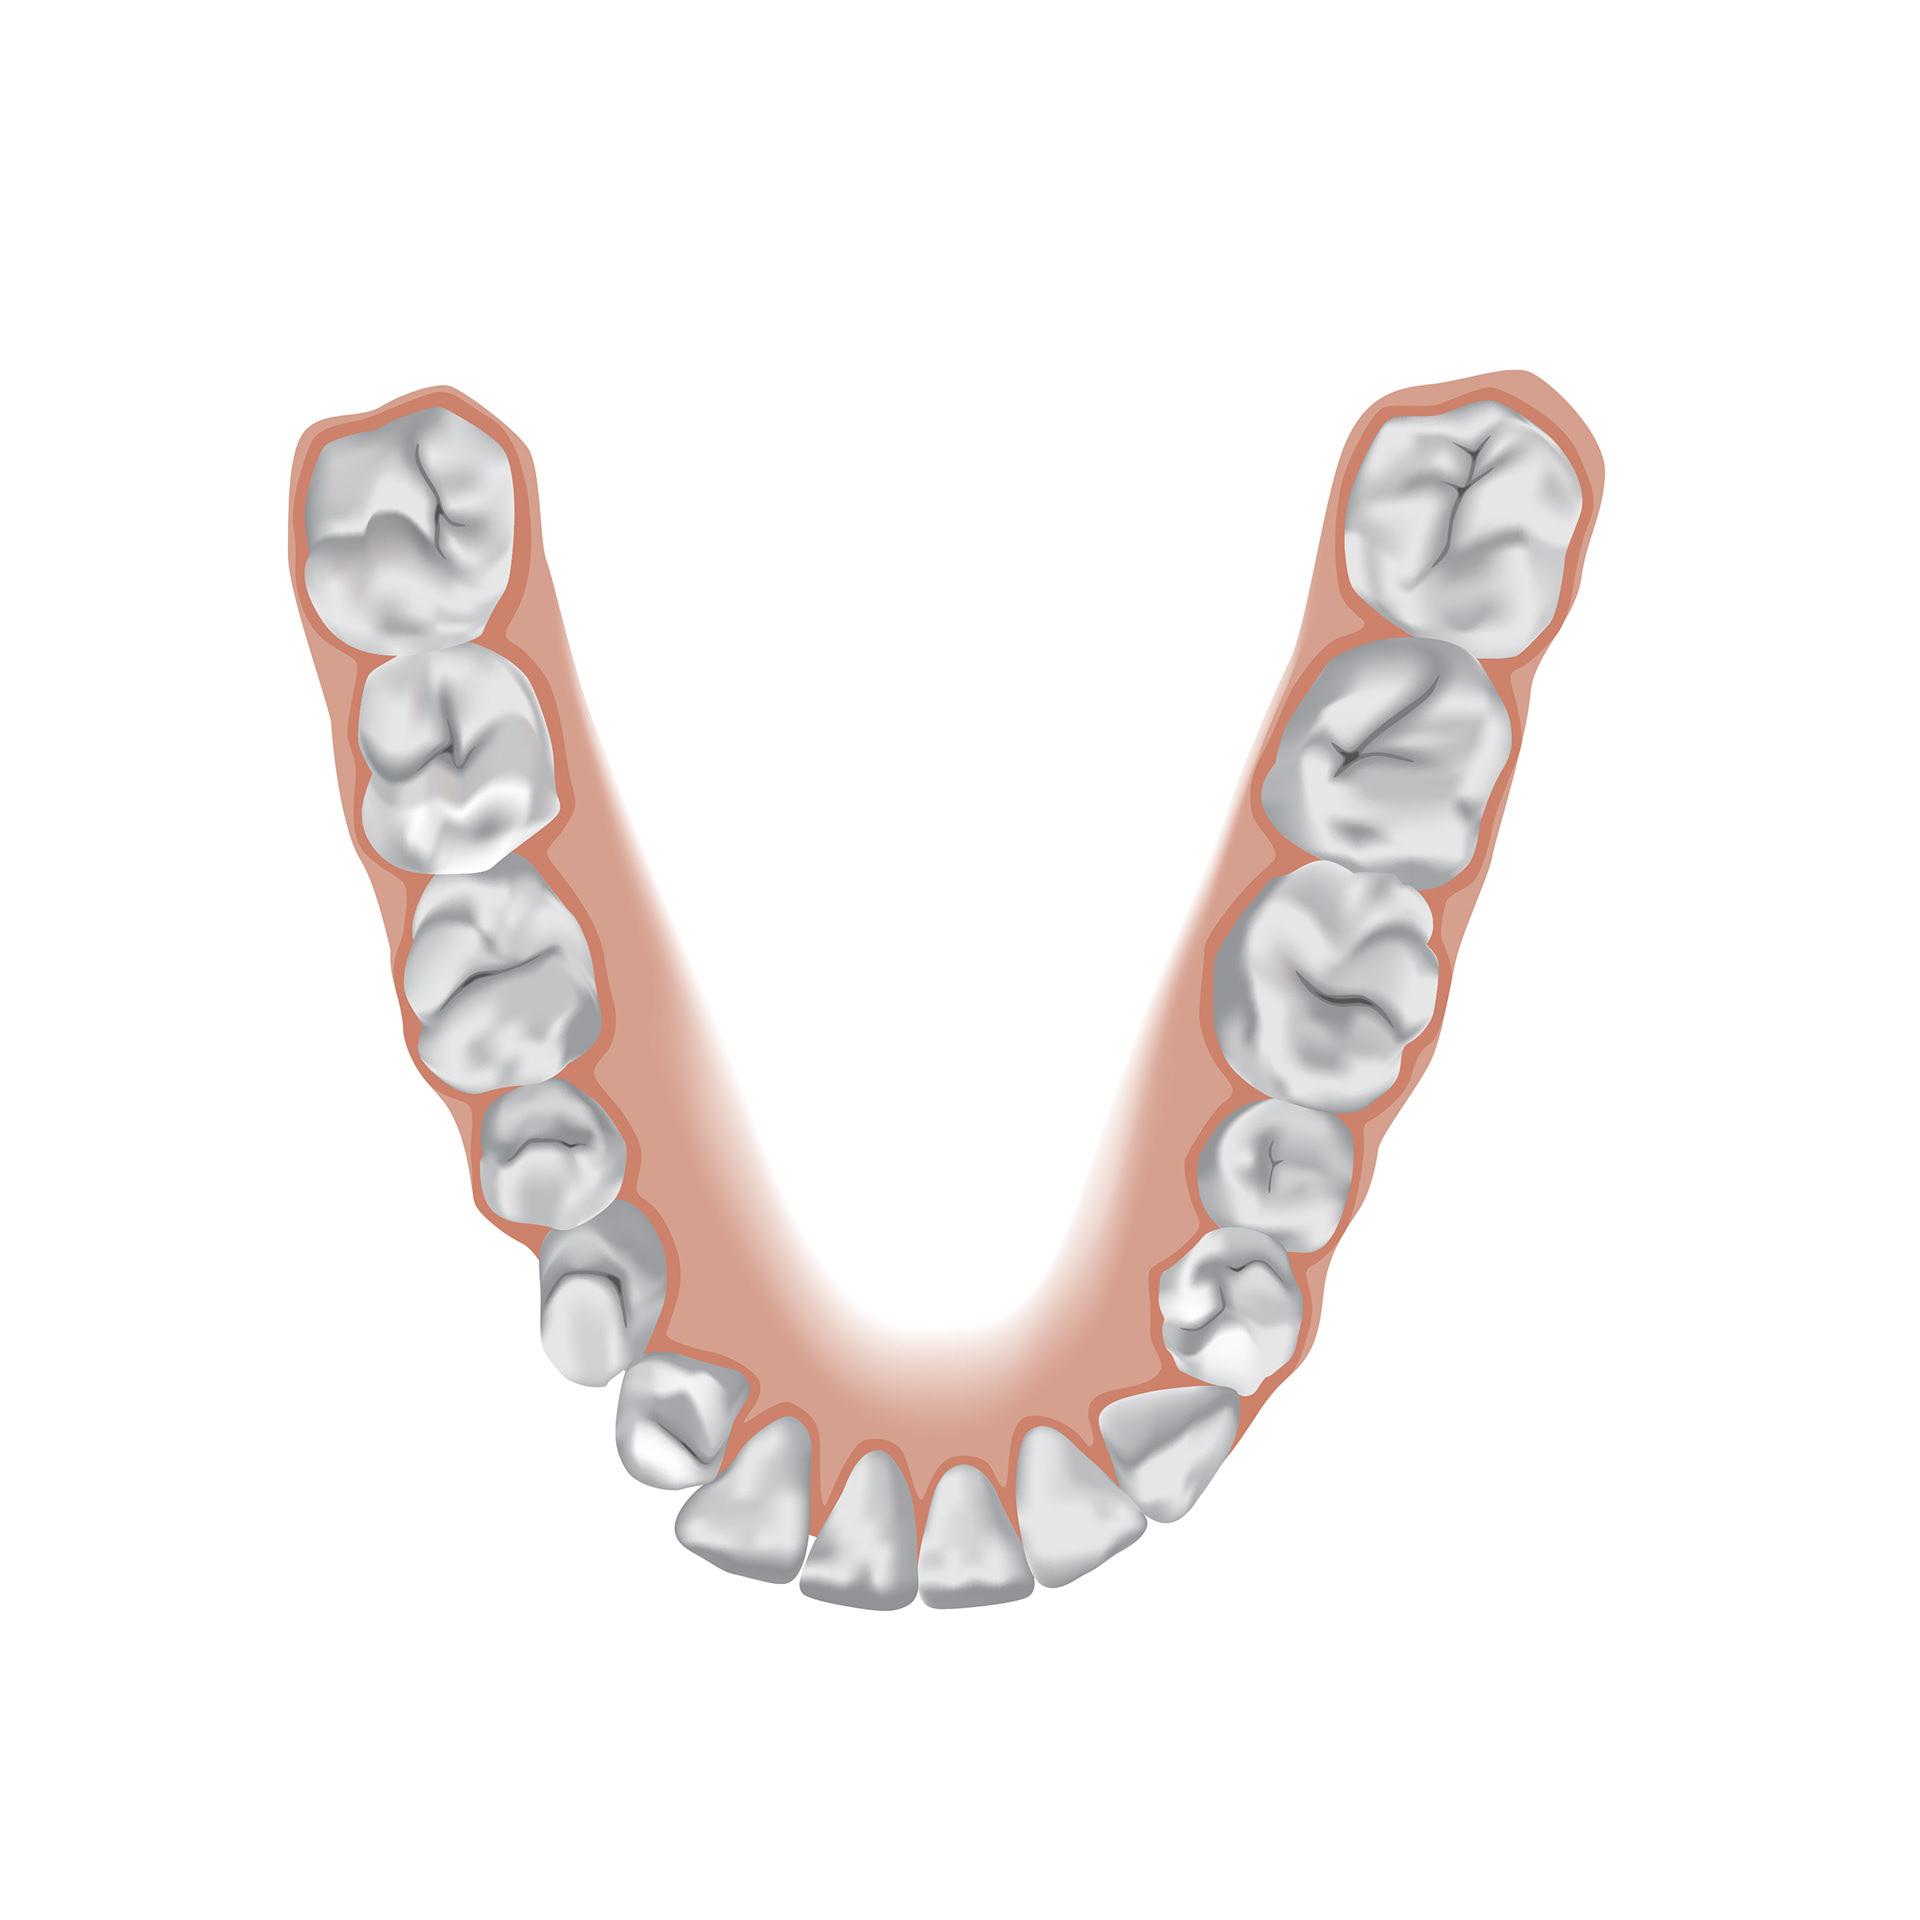 Lydia Sharp - Tooth Anatomy Poster